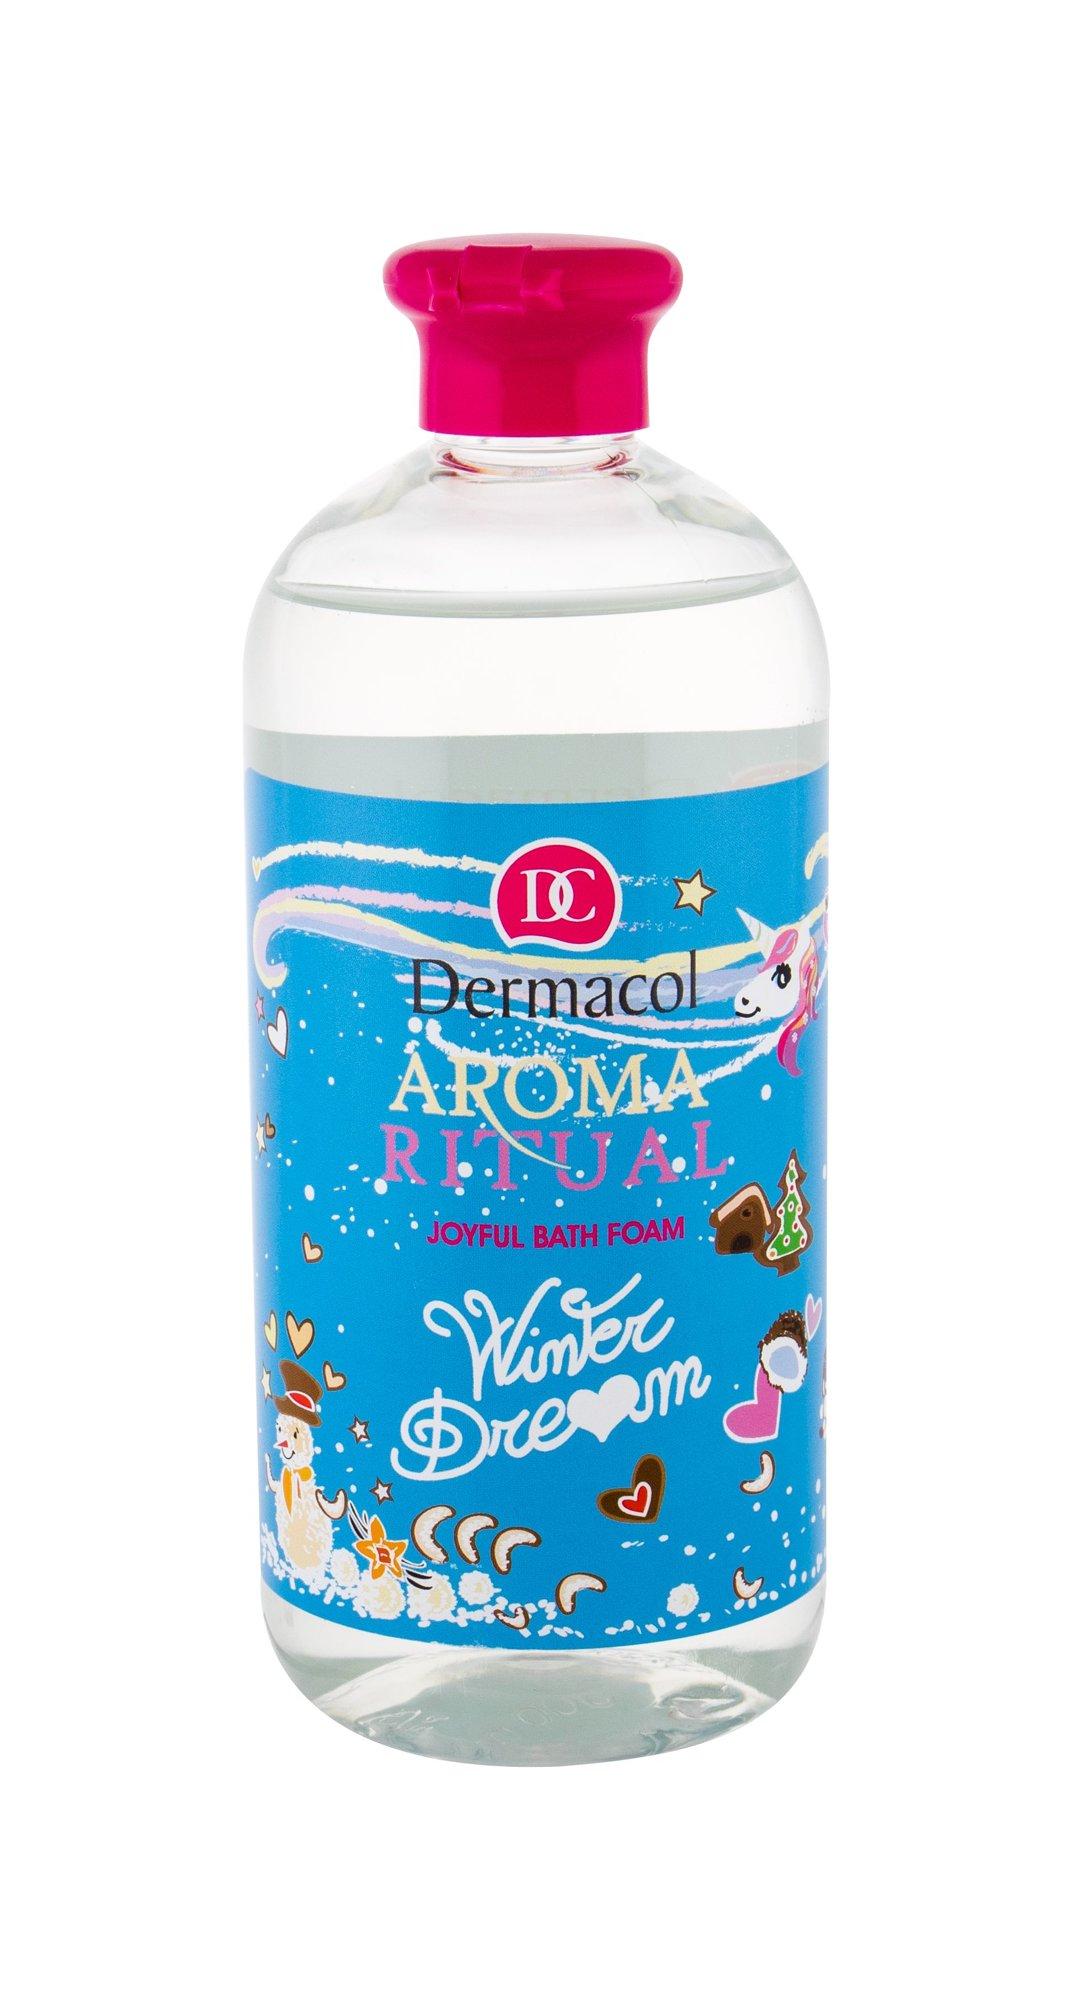 Dermacol Aroma Ritual Bath Foam 500ml